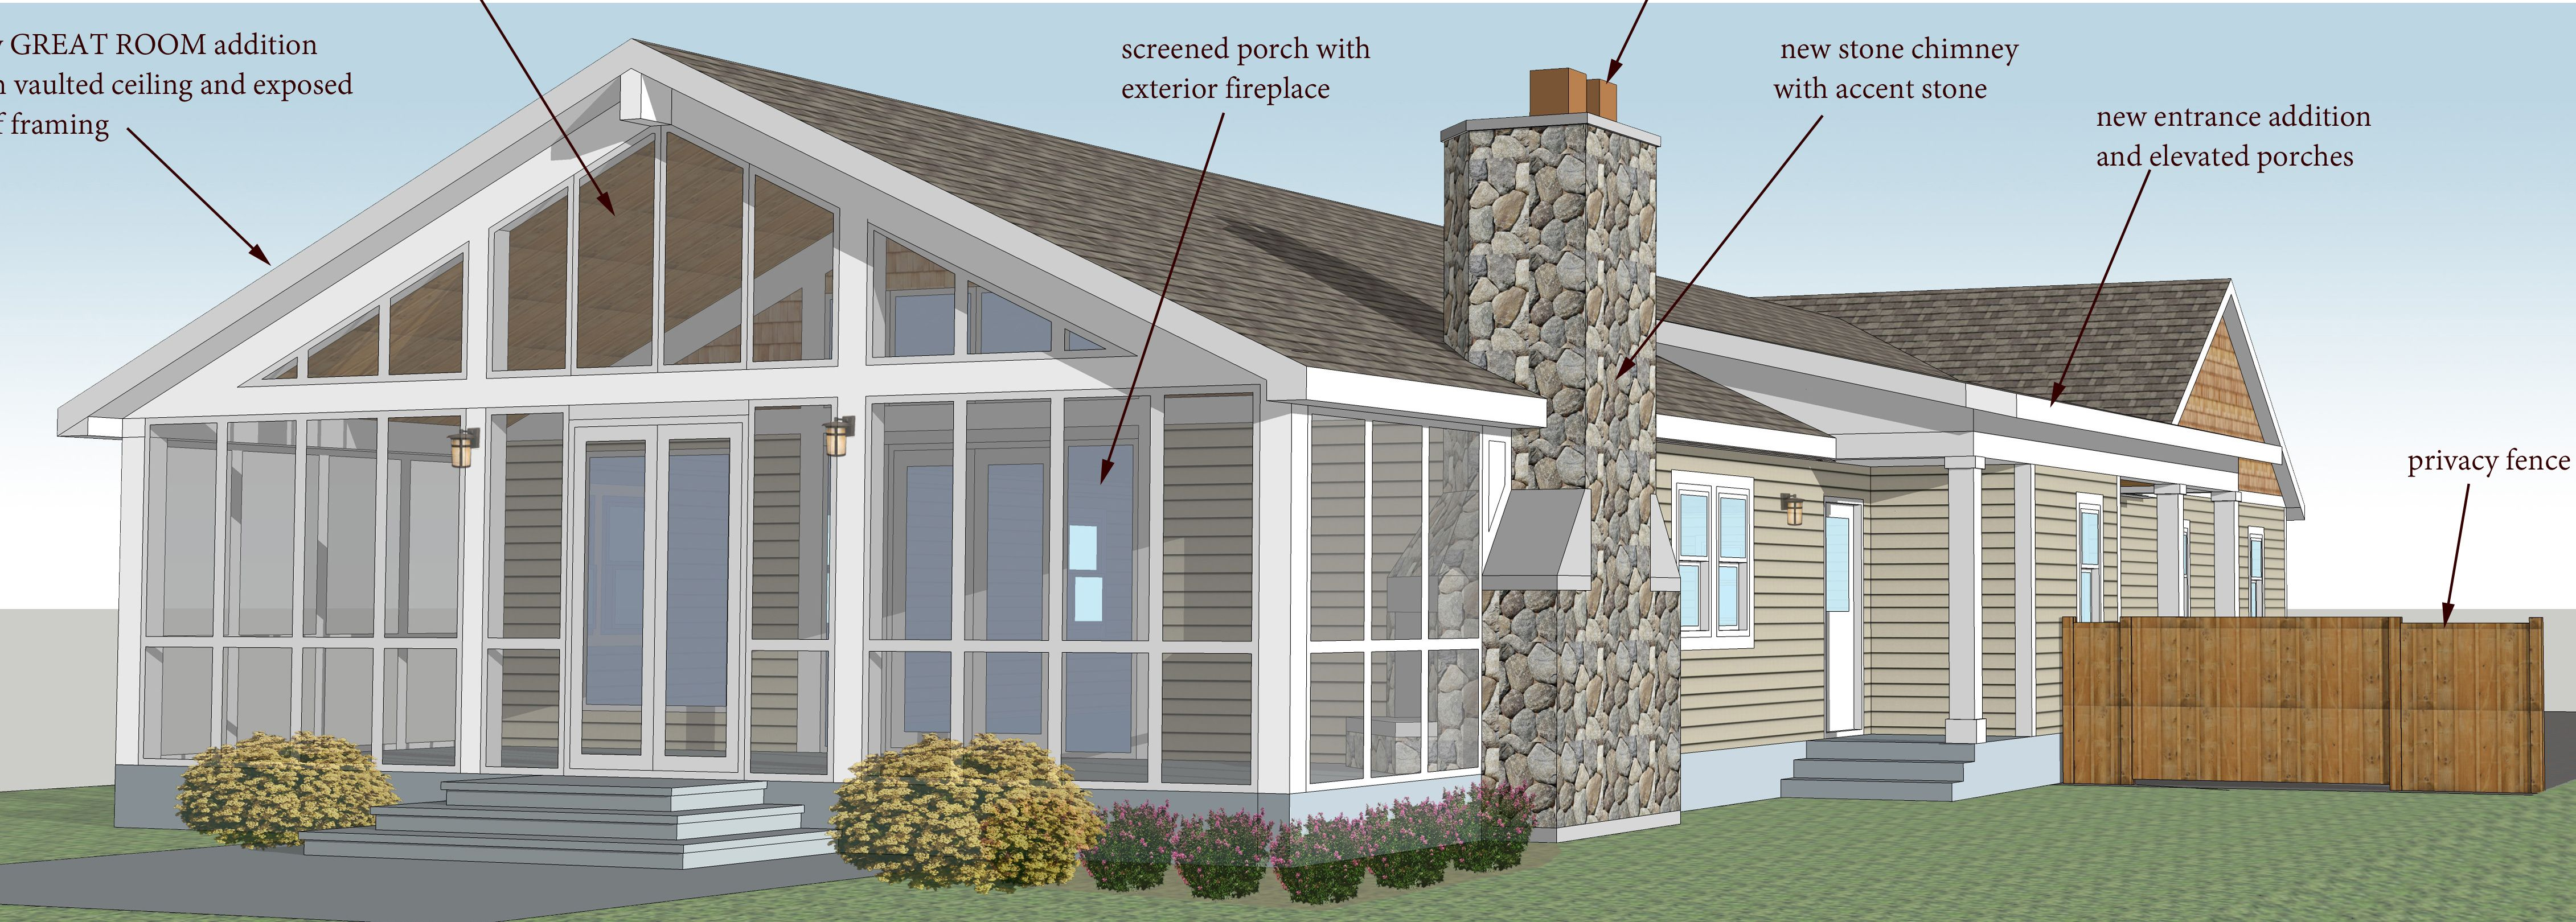 southwestern home remodeling additions lights remodeler wichita and room addition ks entrance kitchen